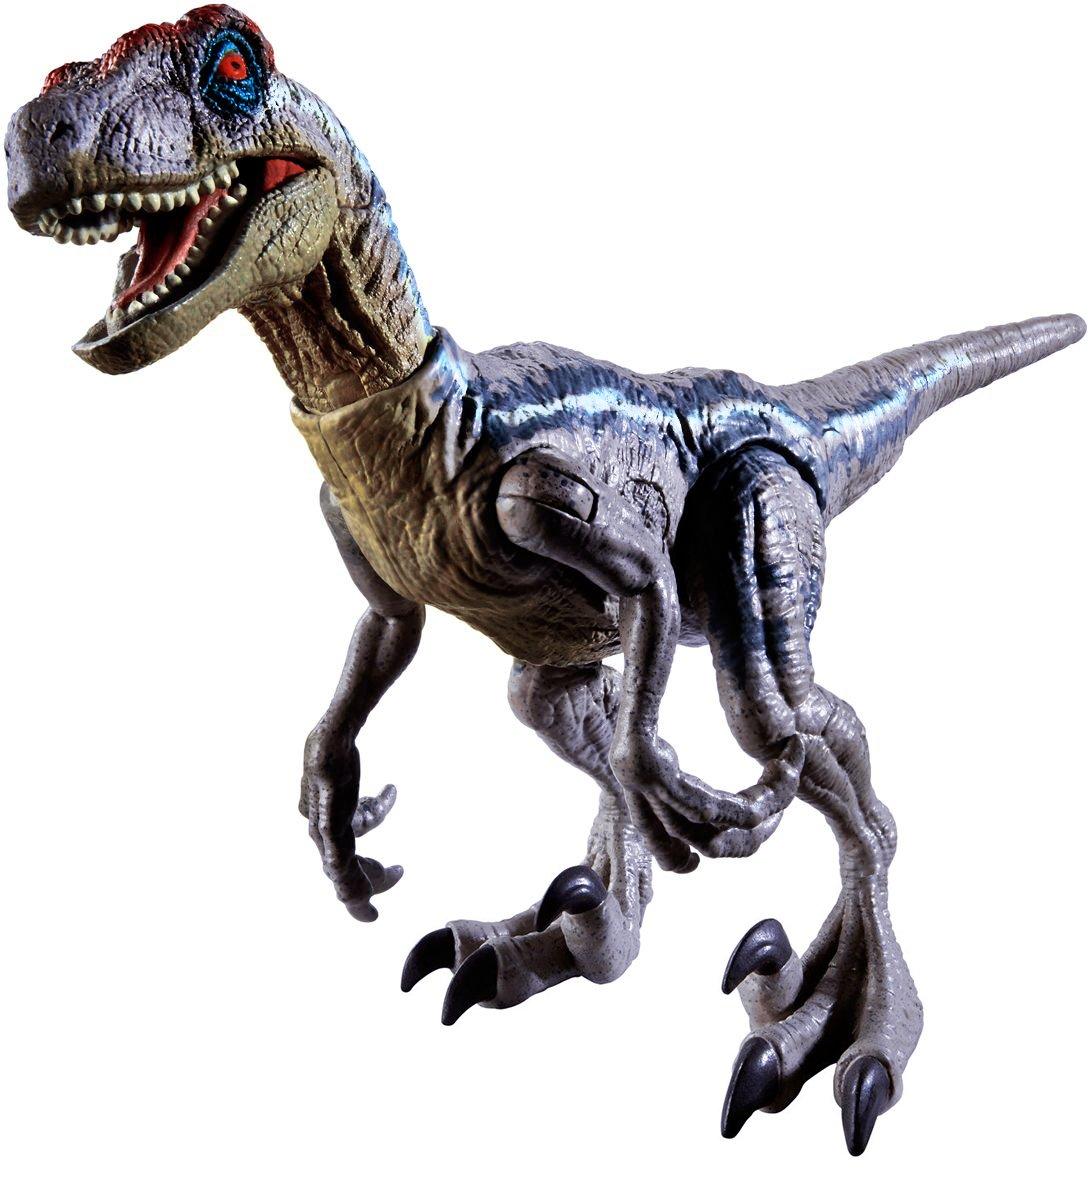 Jurassic Park 3 Velociraptor Toy Chris Pugh on T...